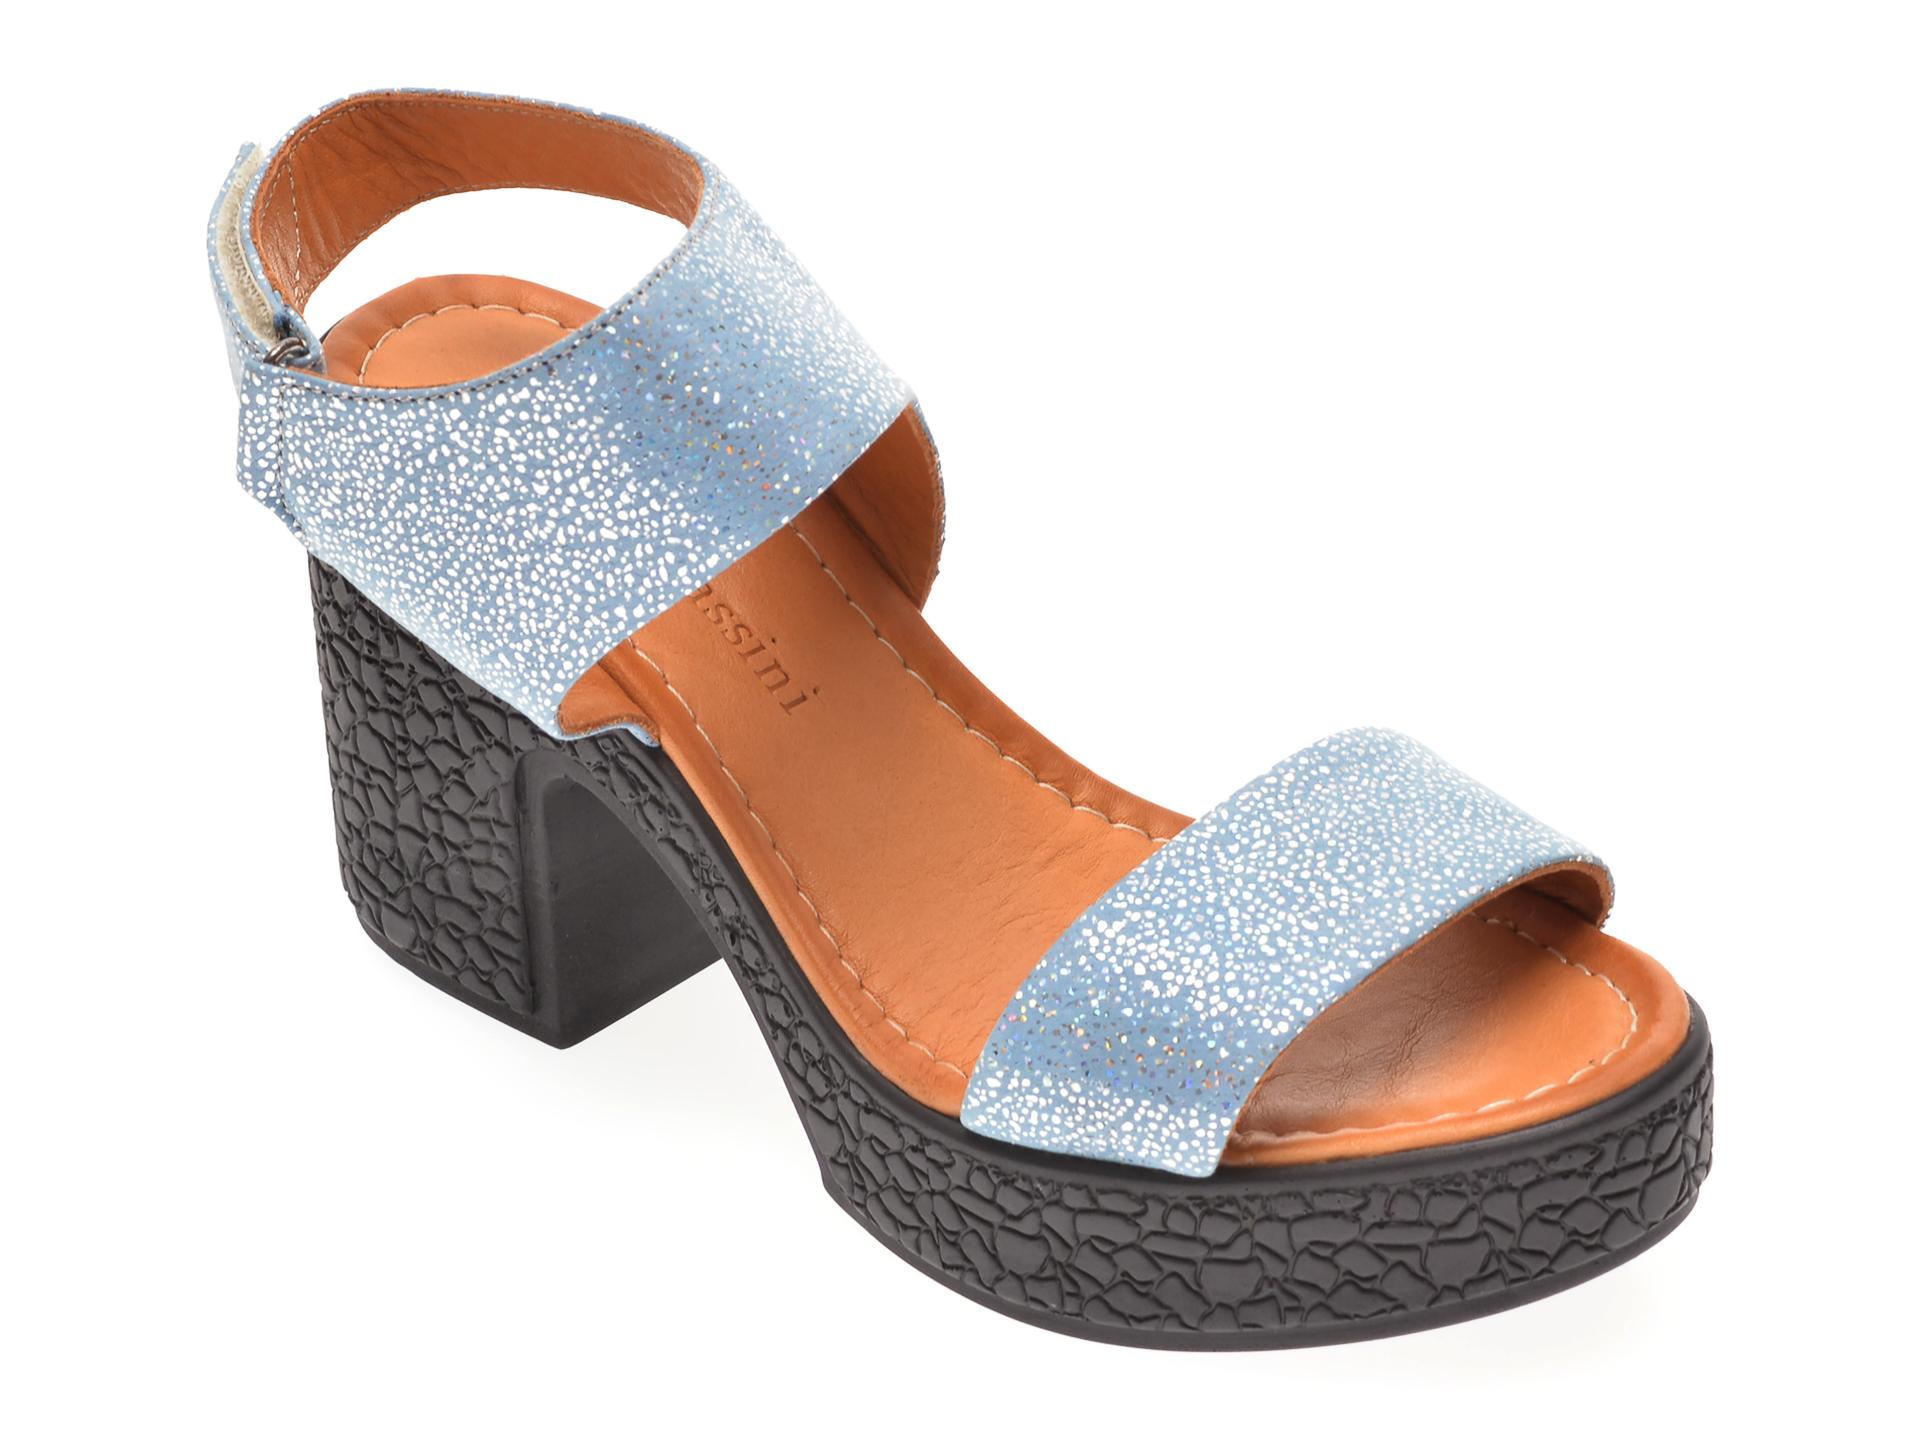 Sandale FLAVIA PASSINI albastre, 1181335, din piele naturala New